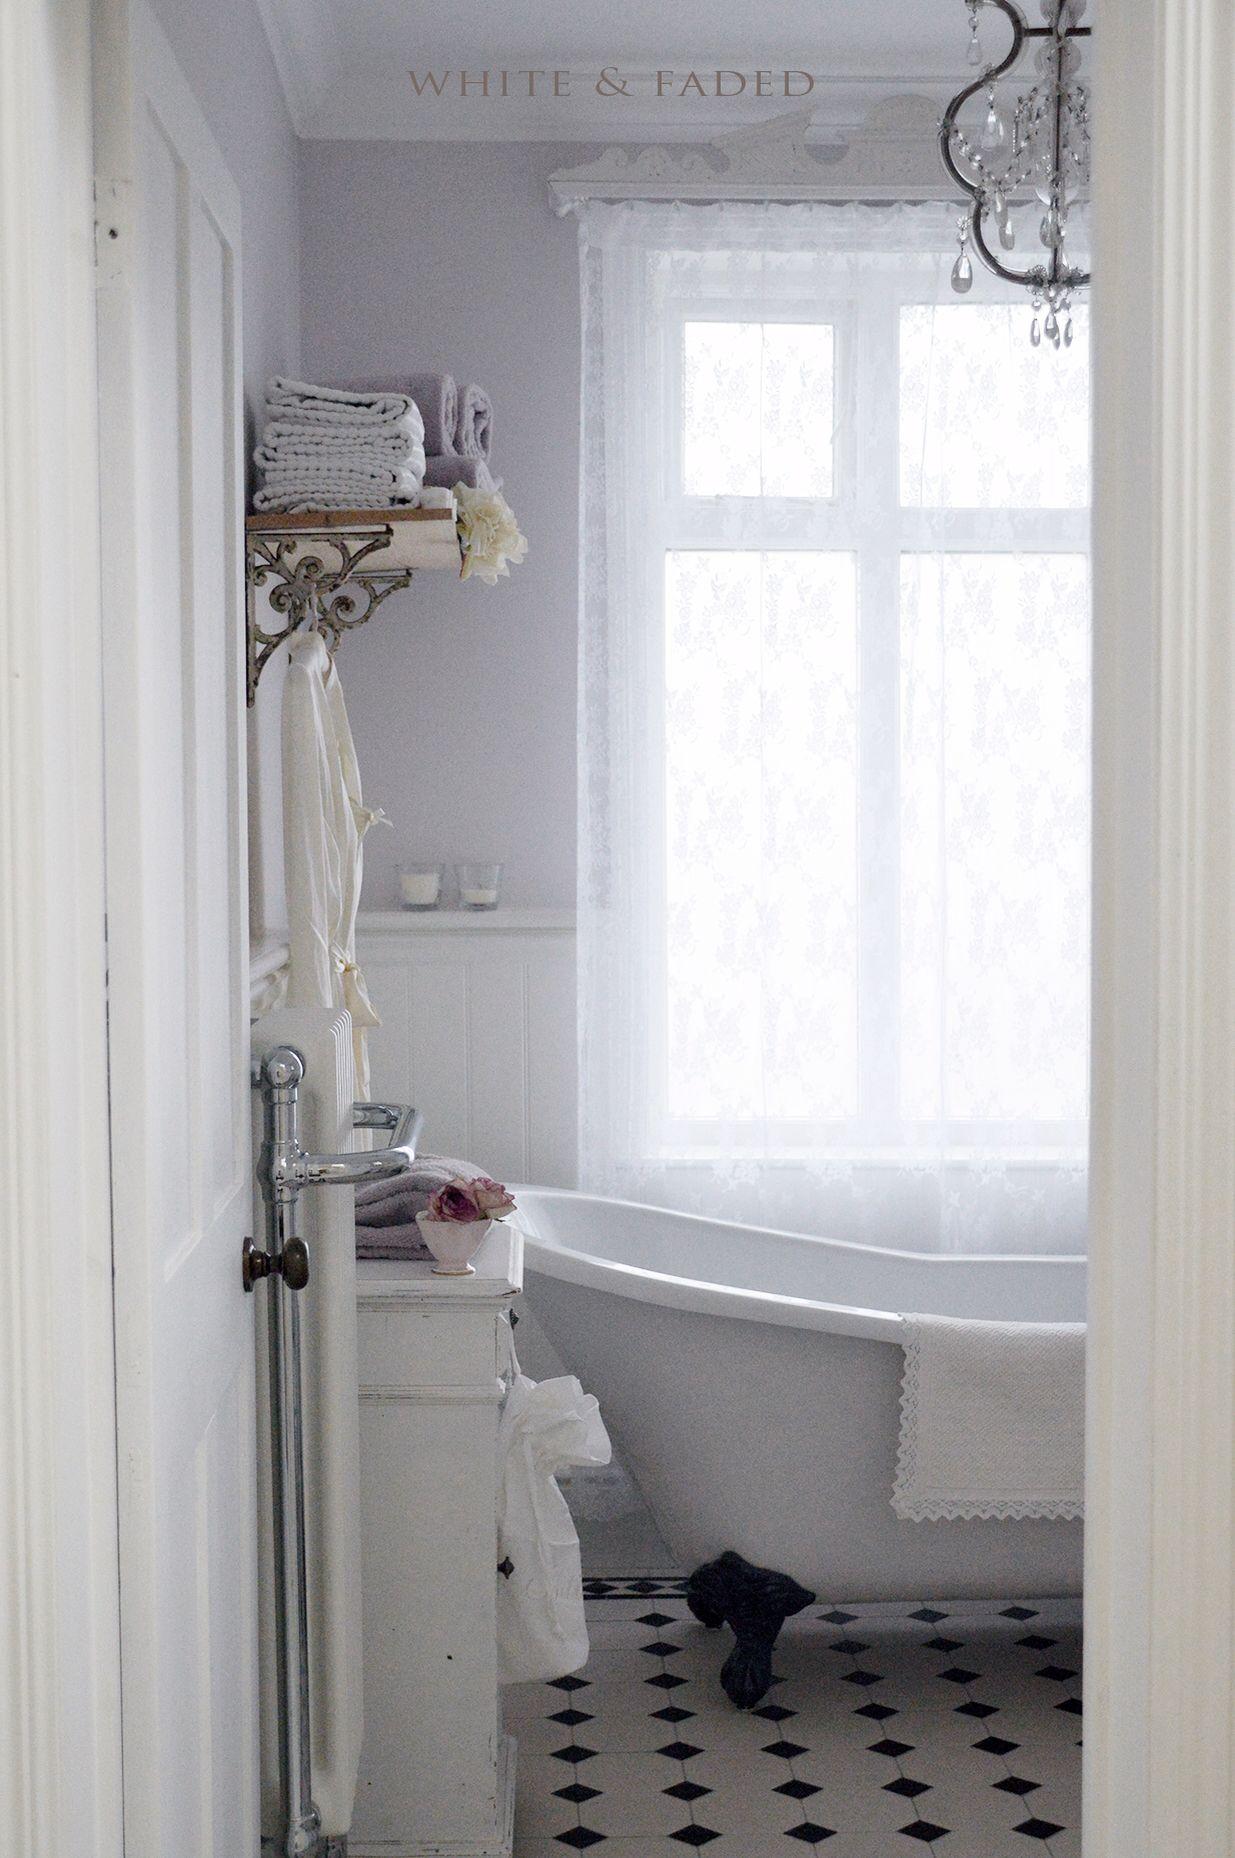 tegels #badkamer #tegel #vloertegels   Landelijke badkamers ...